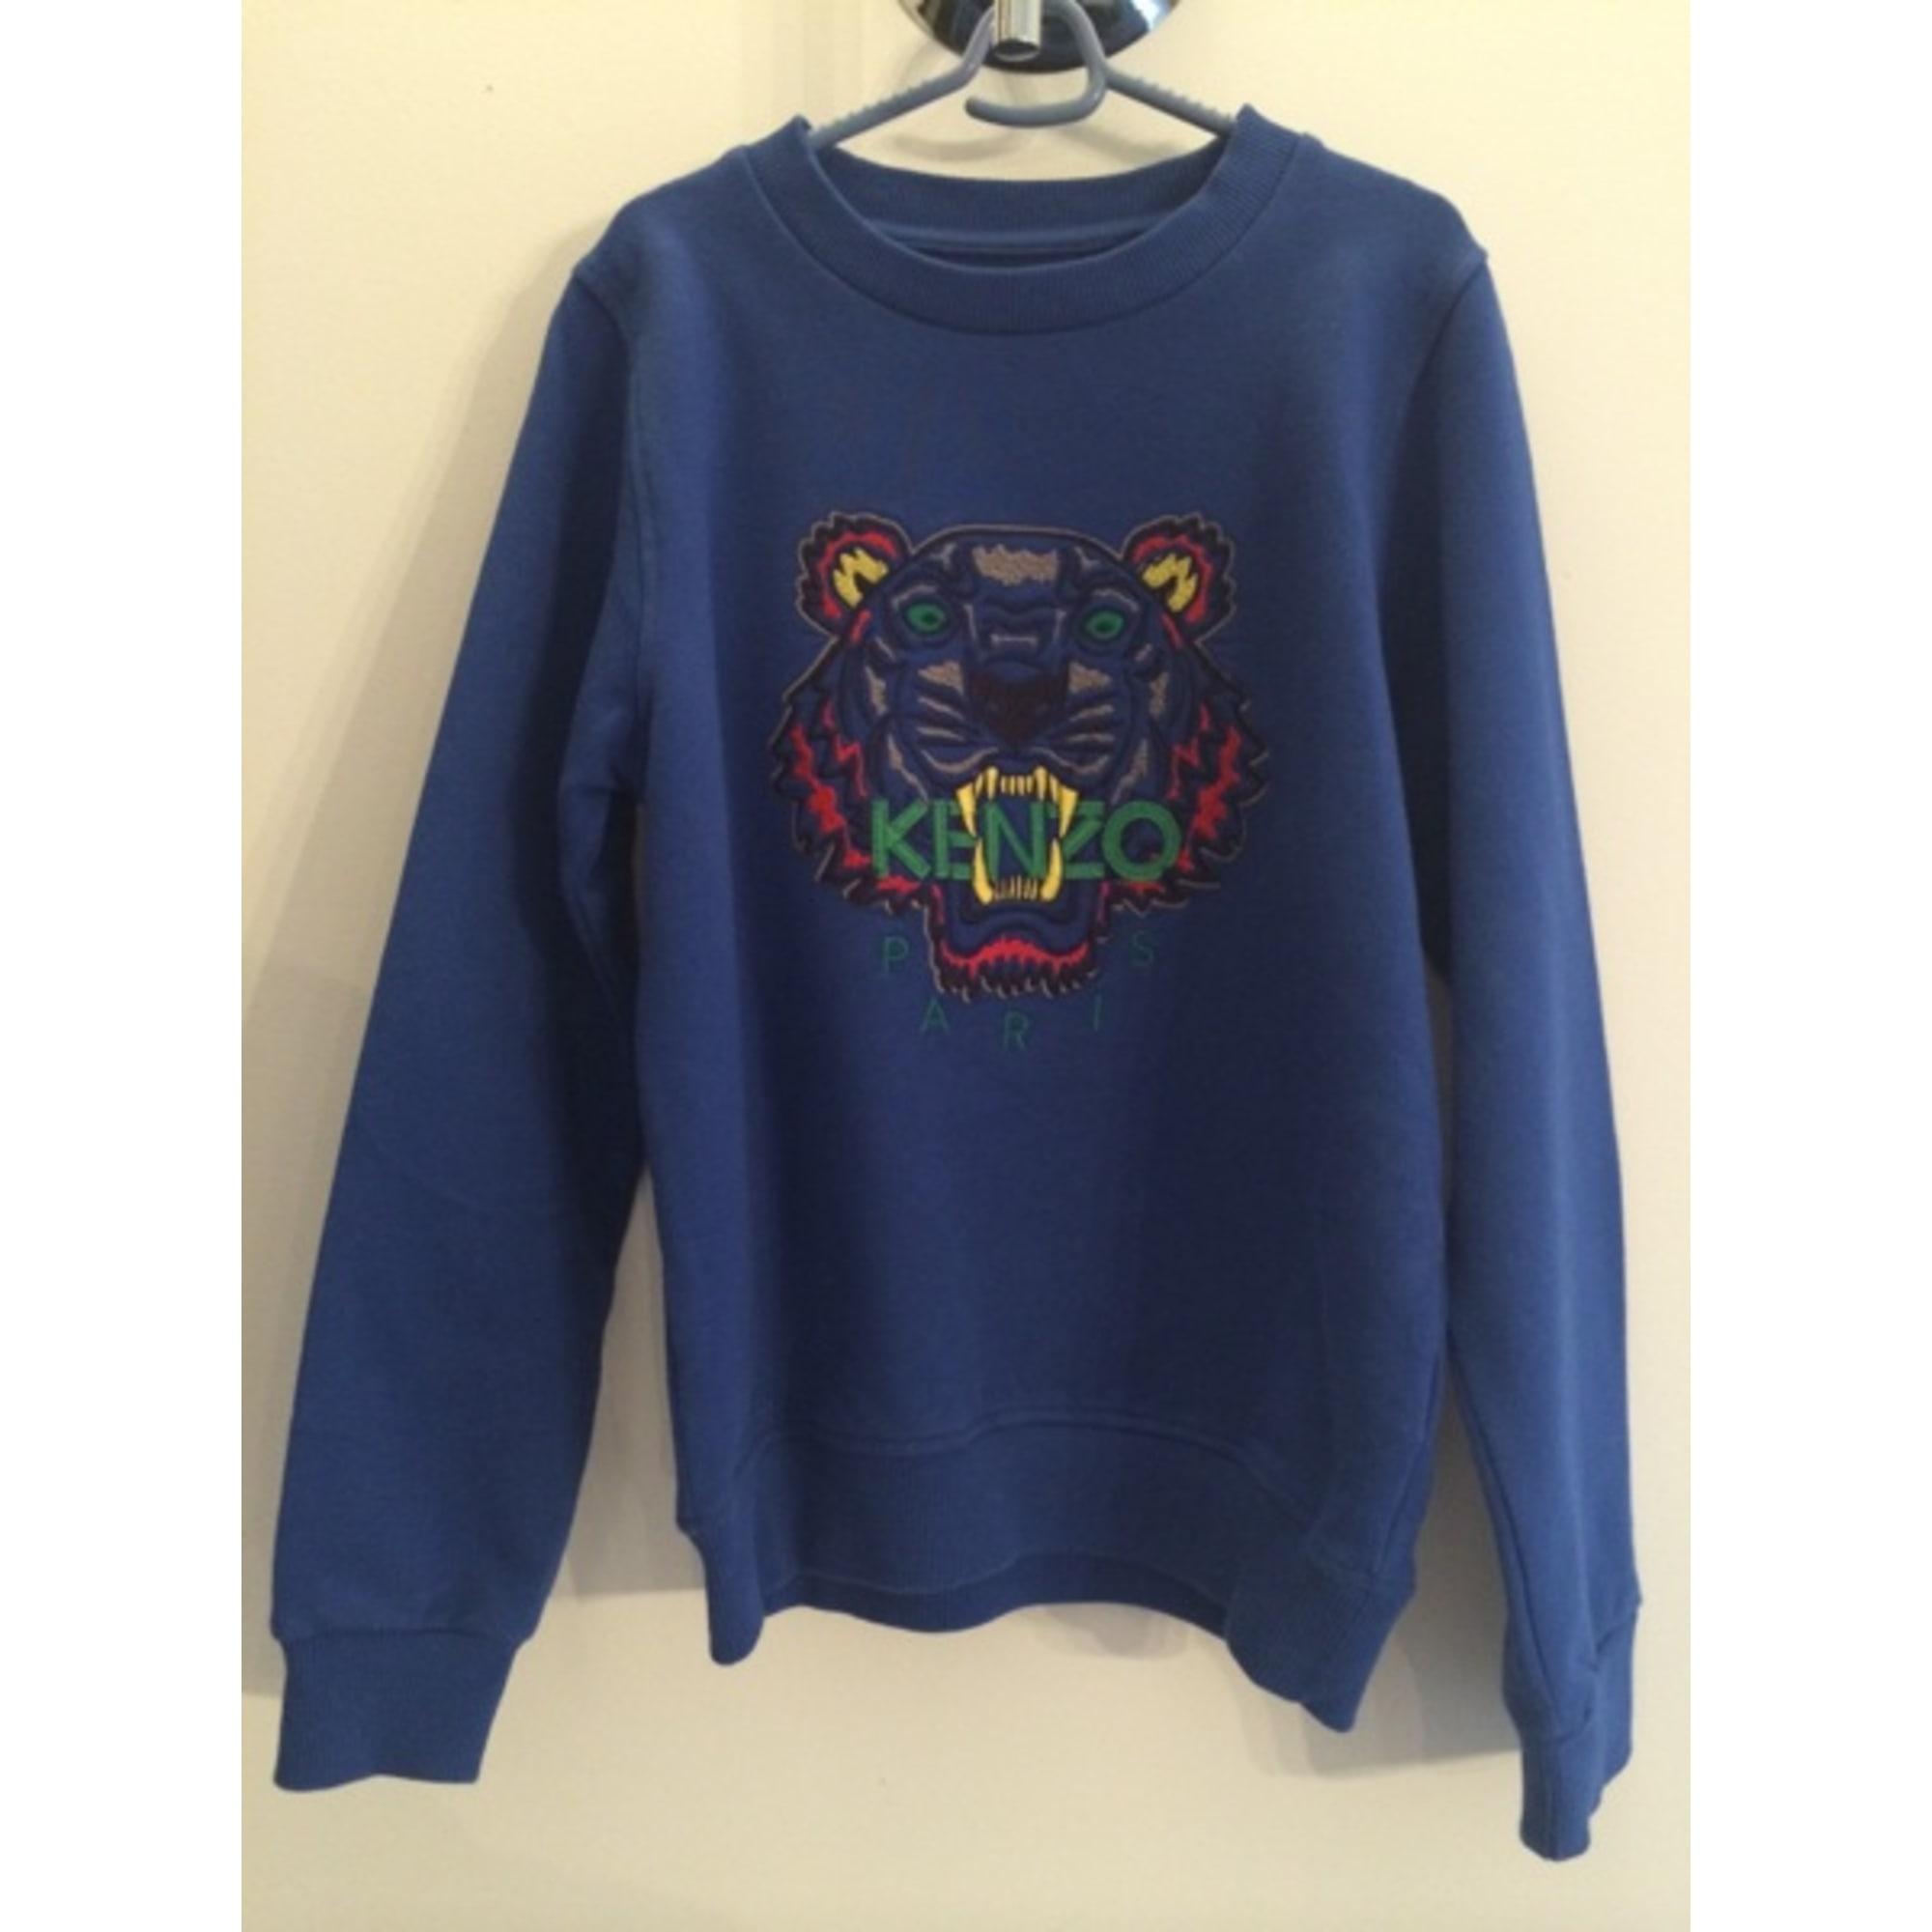 820ad9980c4b Sweat KENZO Bleu, bleu marine, bleu turquoise